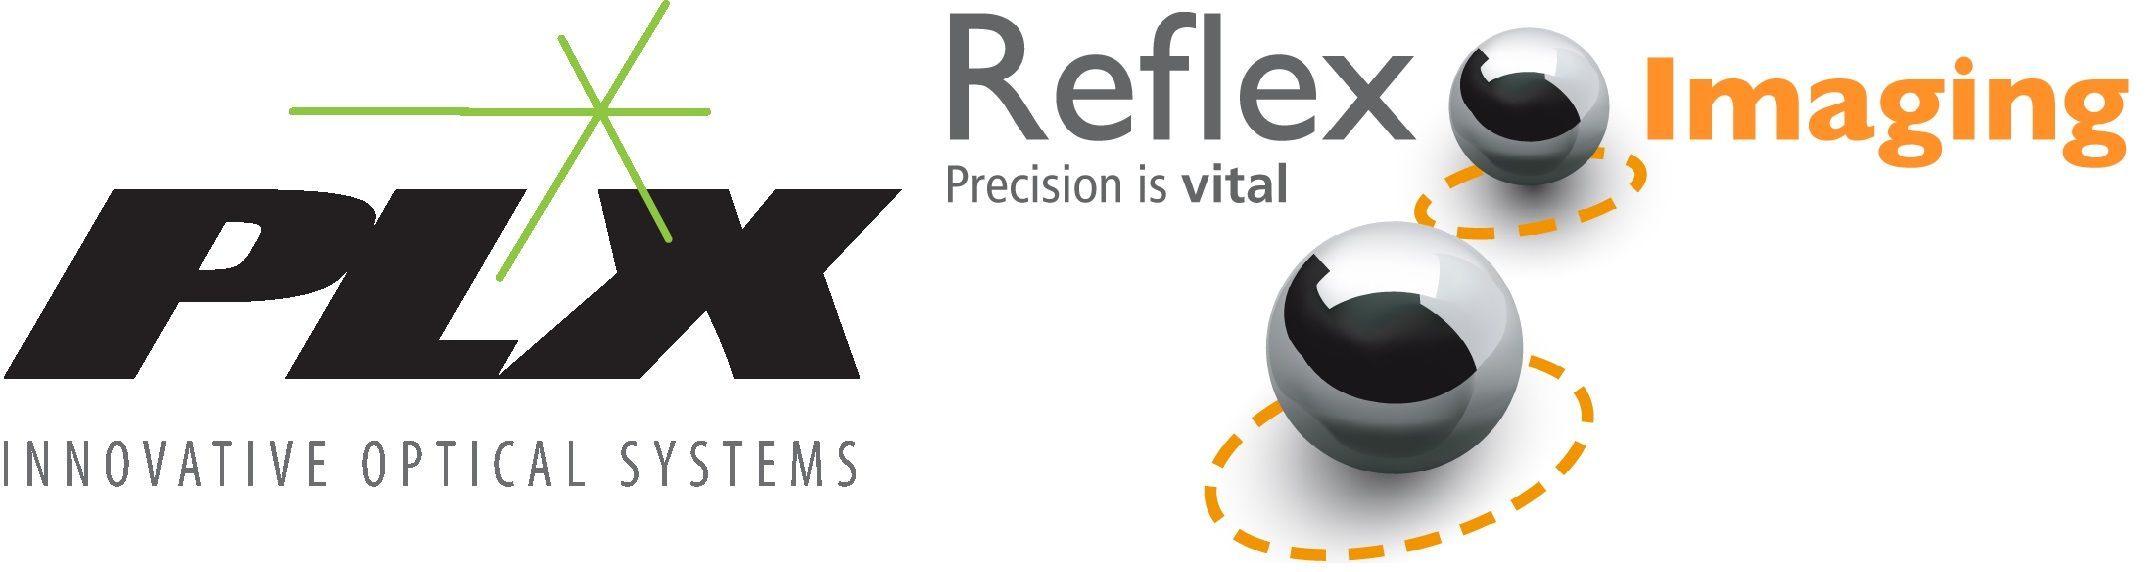 Plx reflex logo banner